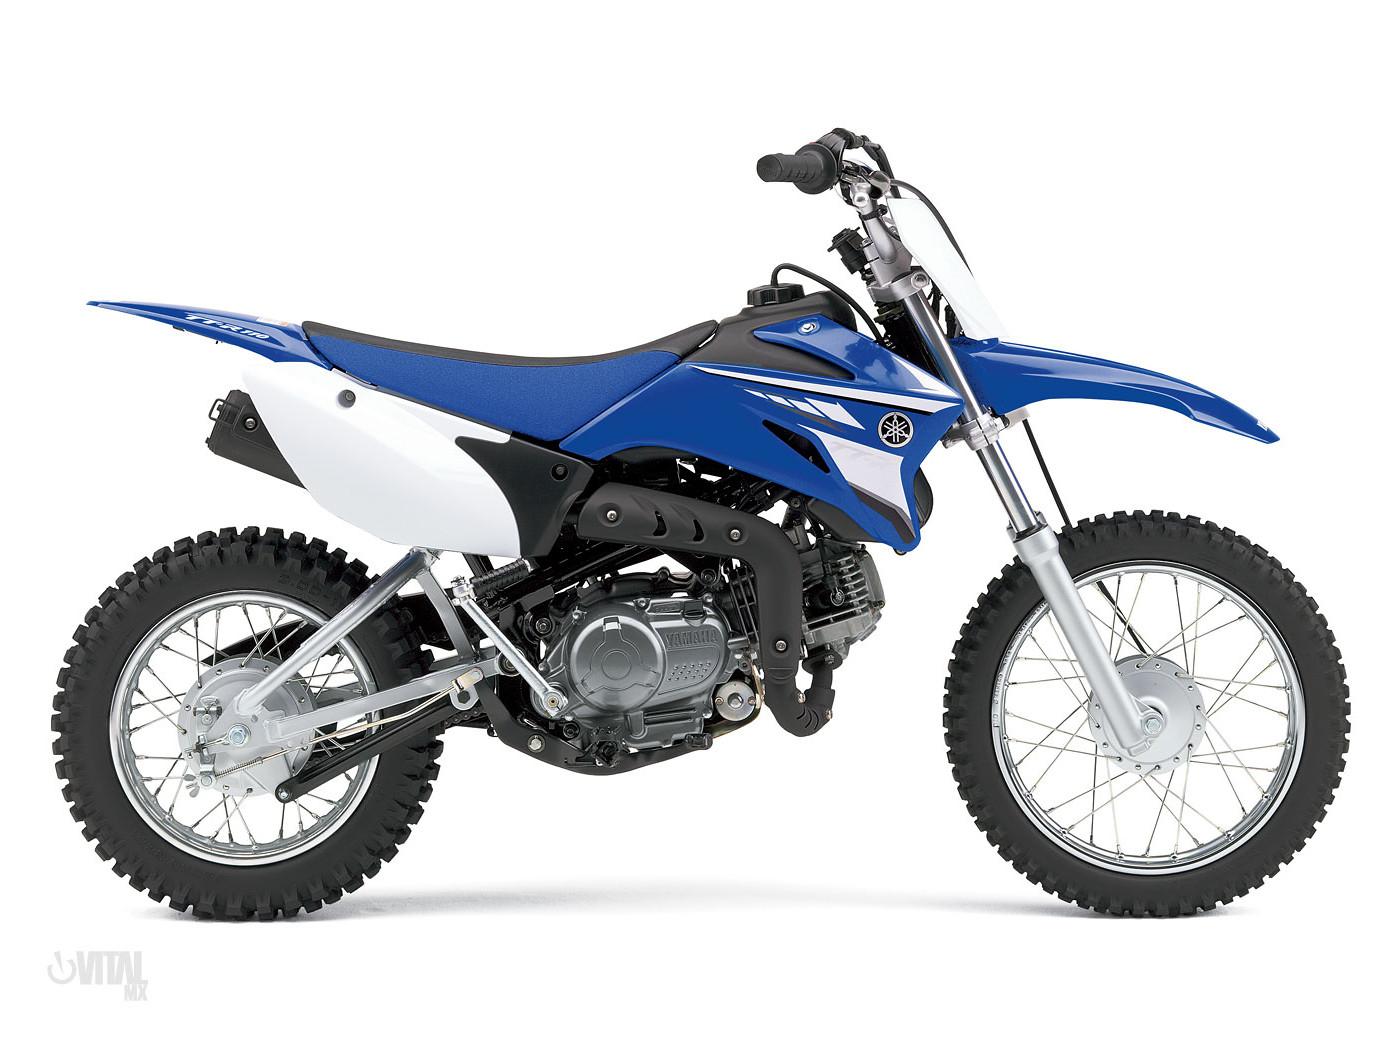 Plastic No Number Plate Cover Kit For Yamaha Dirt Pit Bike TTR110 TTR 110E